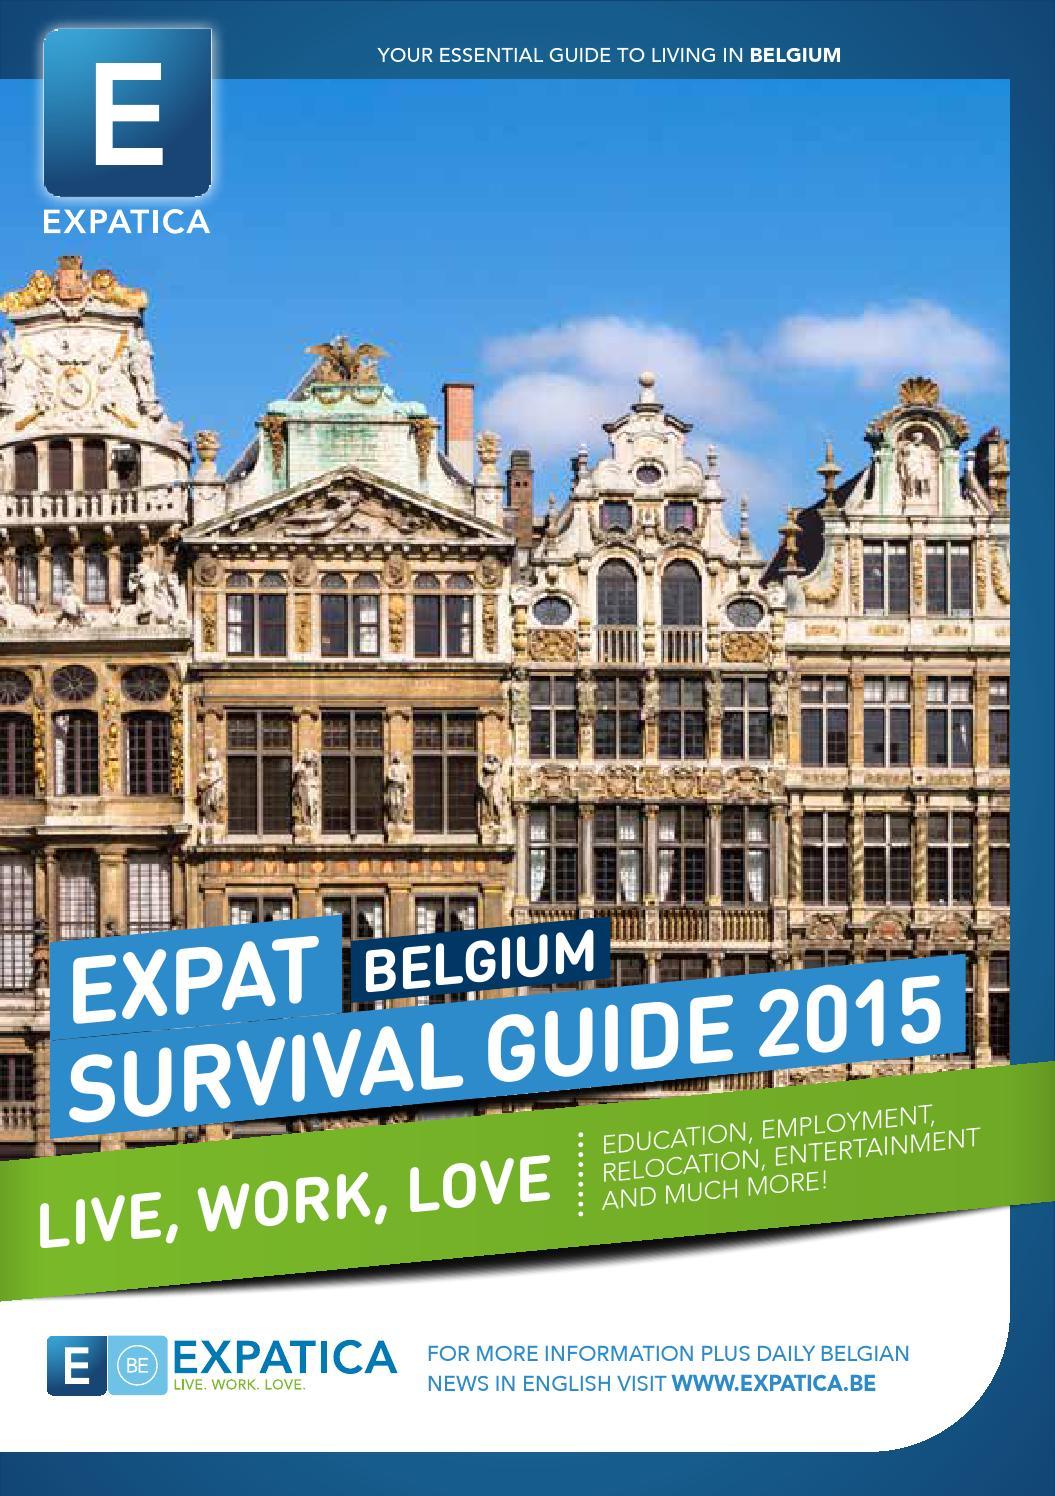 Expat Survival Guide BE 2015